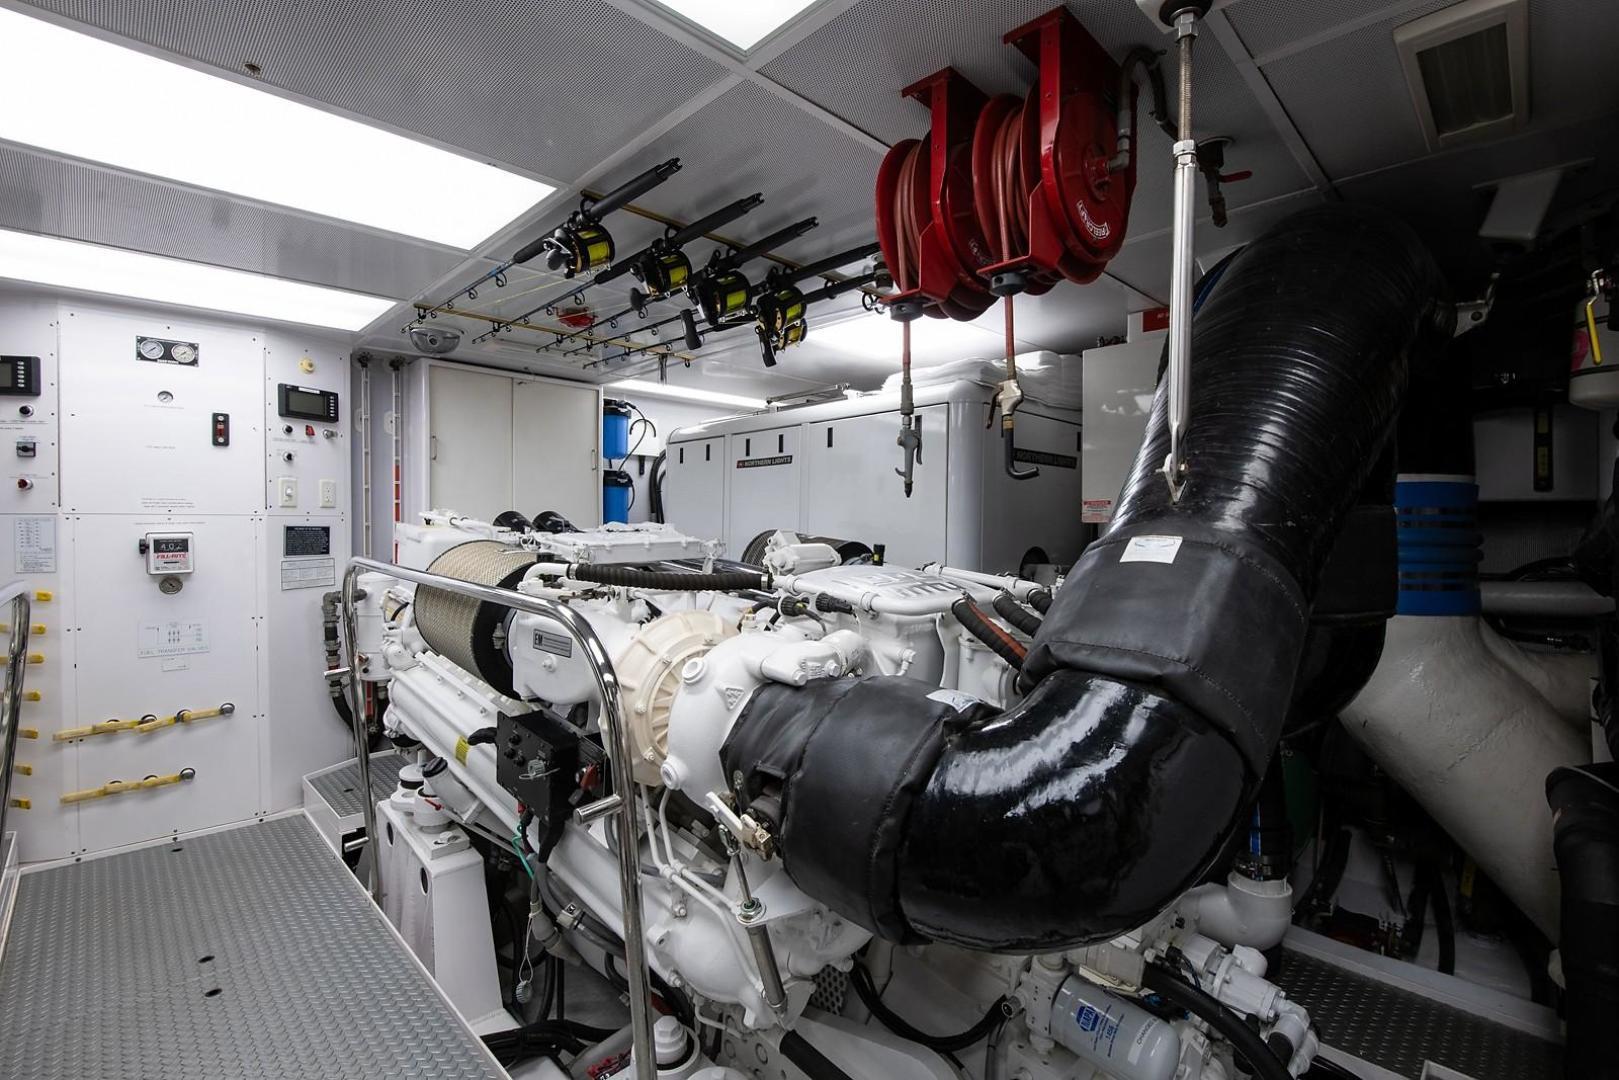 Westport-Motoryacht 2010-Cavallino Fort Lauderdale-Florida-United States-Engine Room-1270081 | Thumbnail